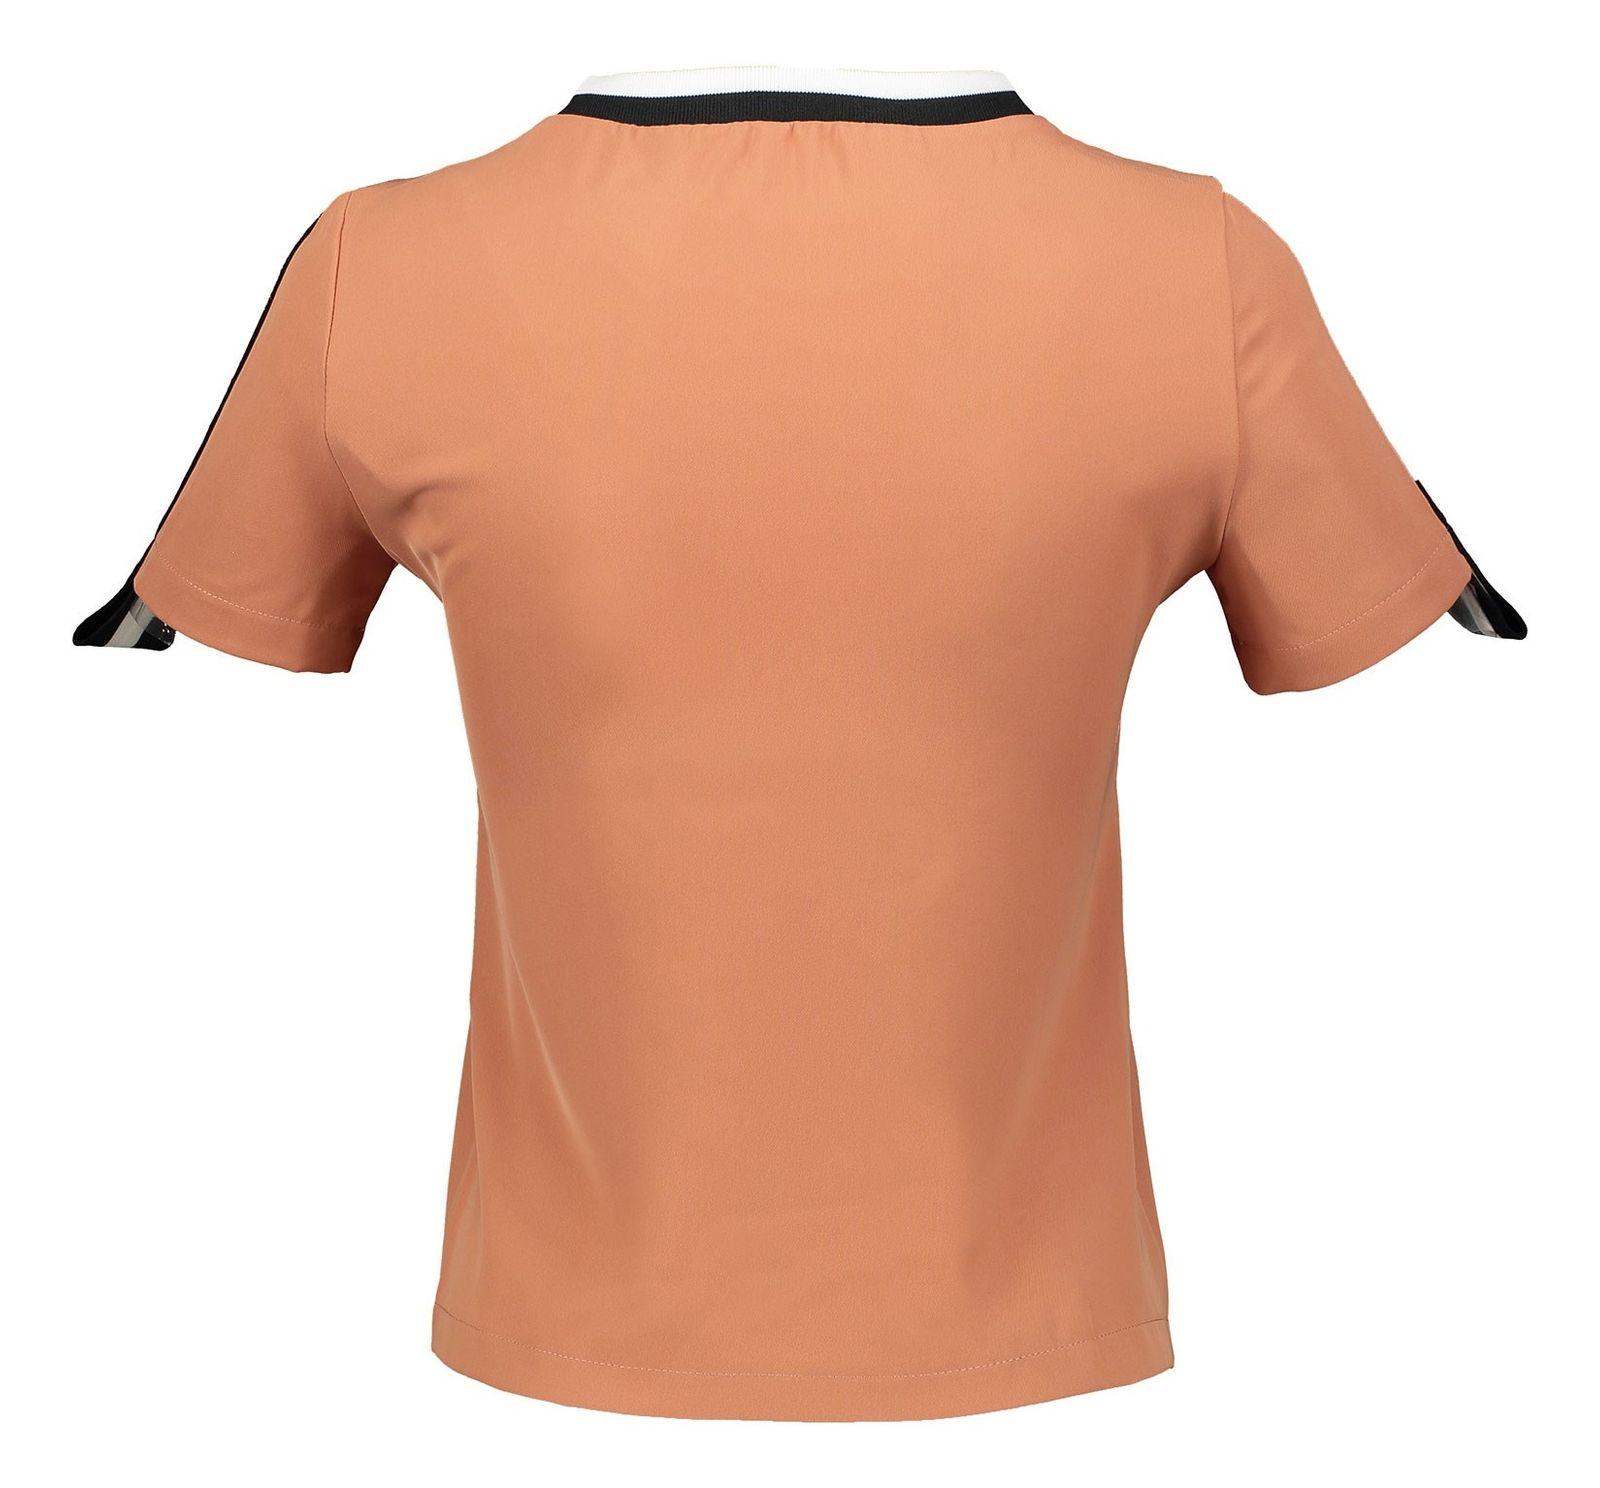 تی شرت یقه گرد زنانه - امپریال - نارنجي تيره - 4